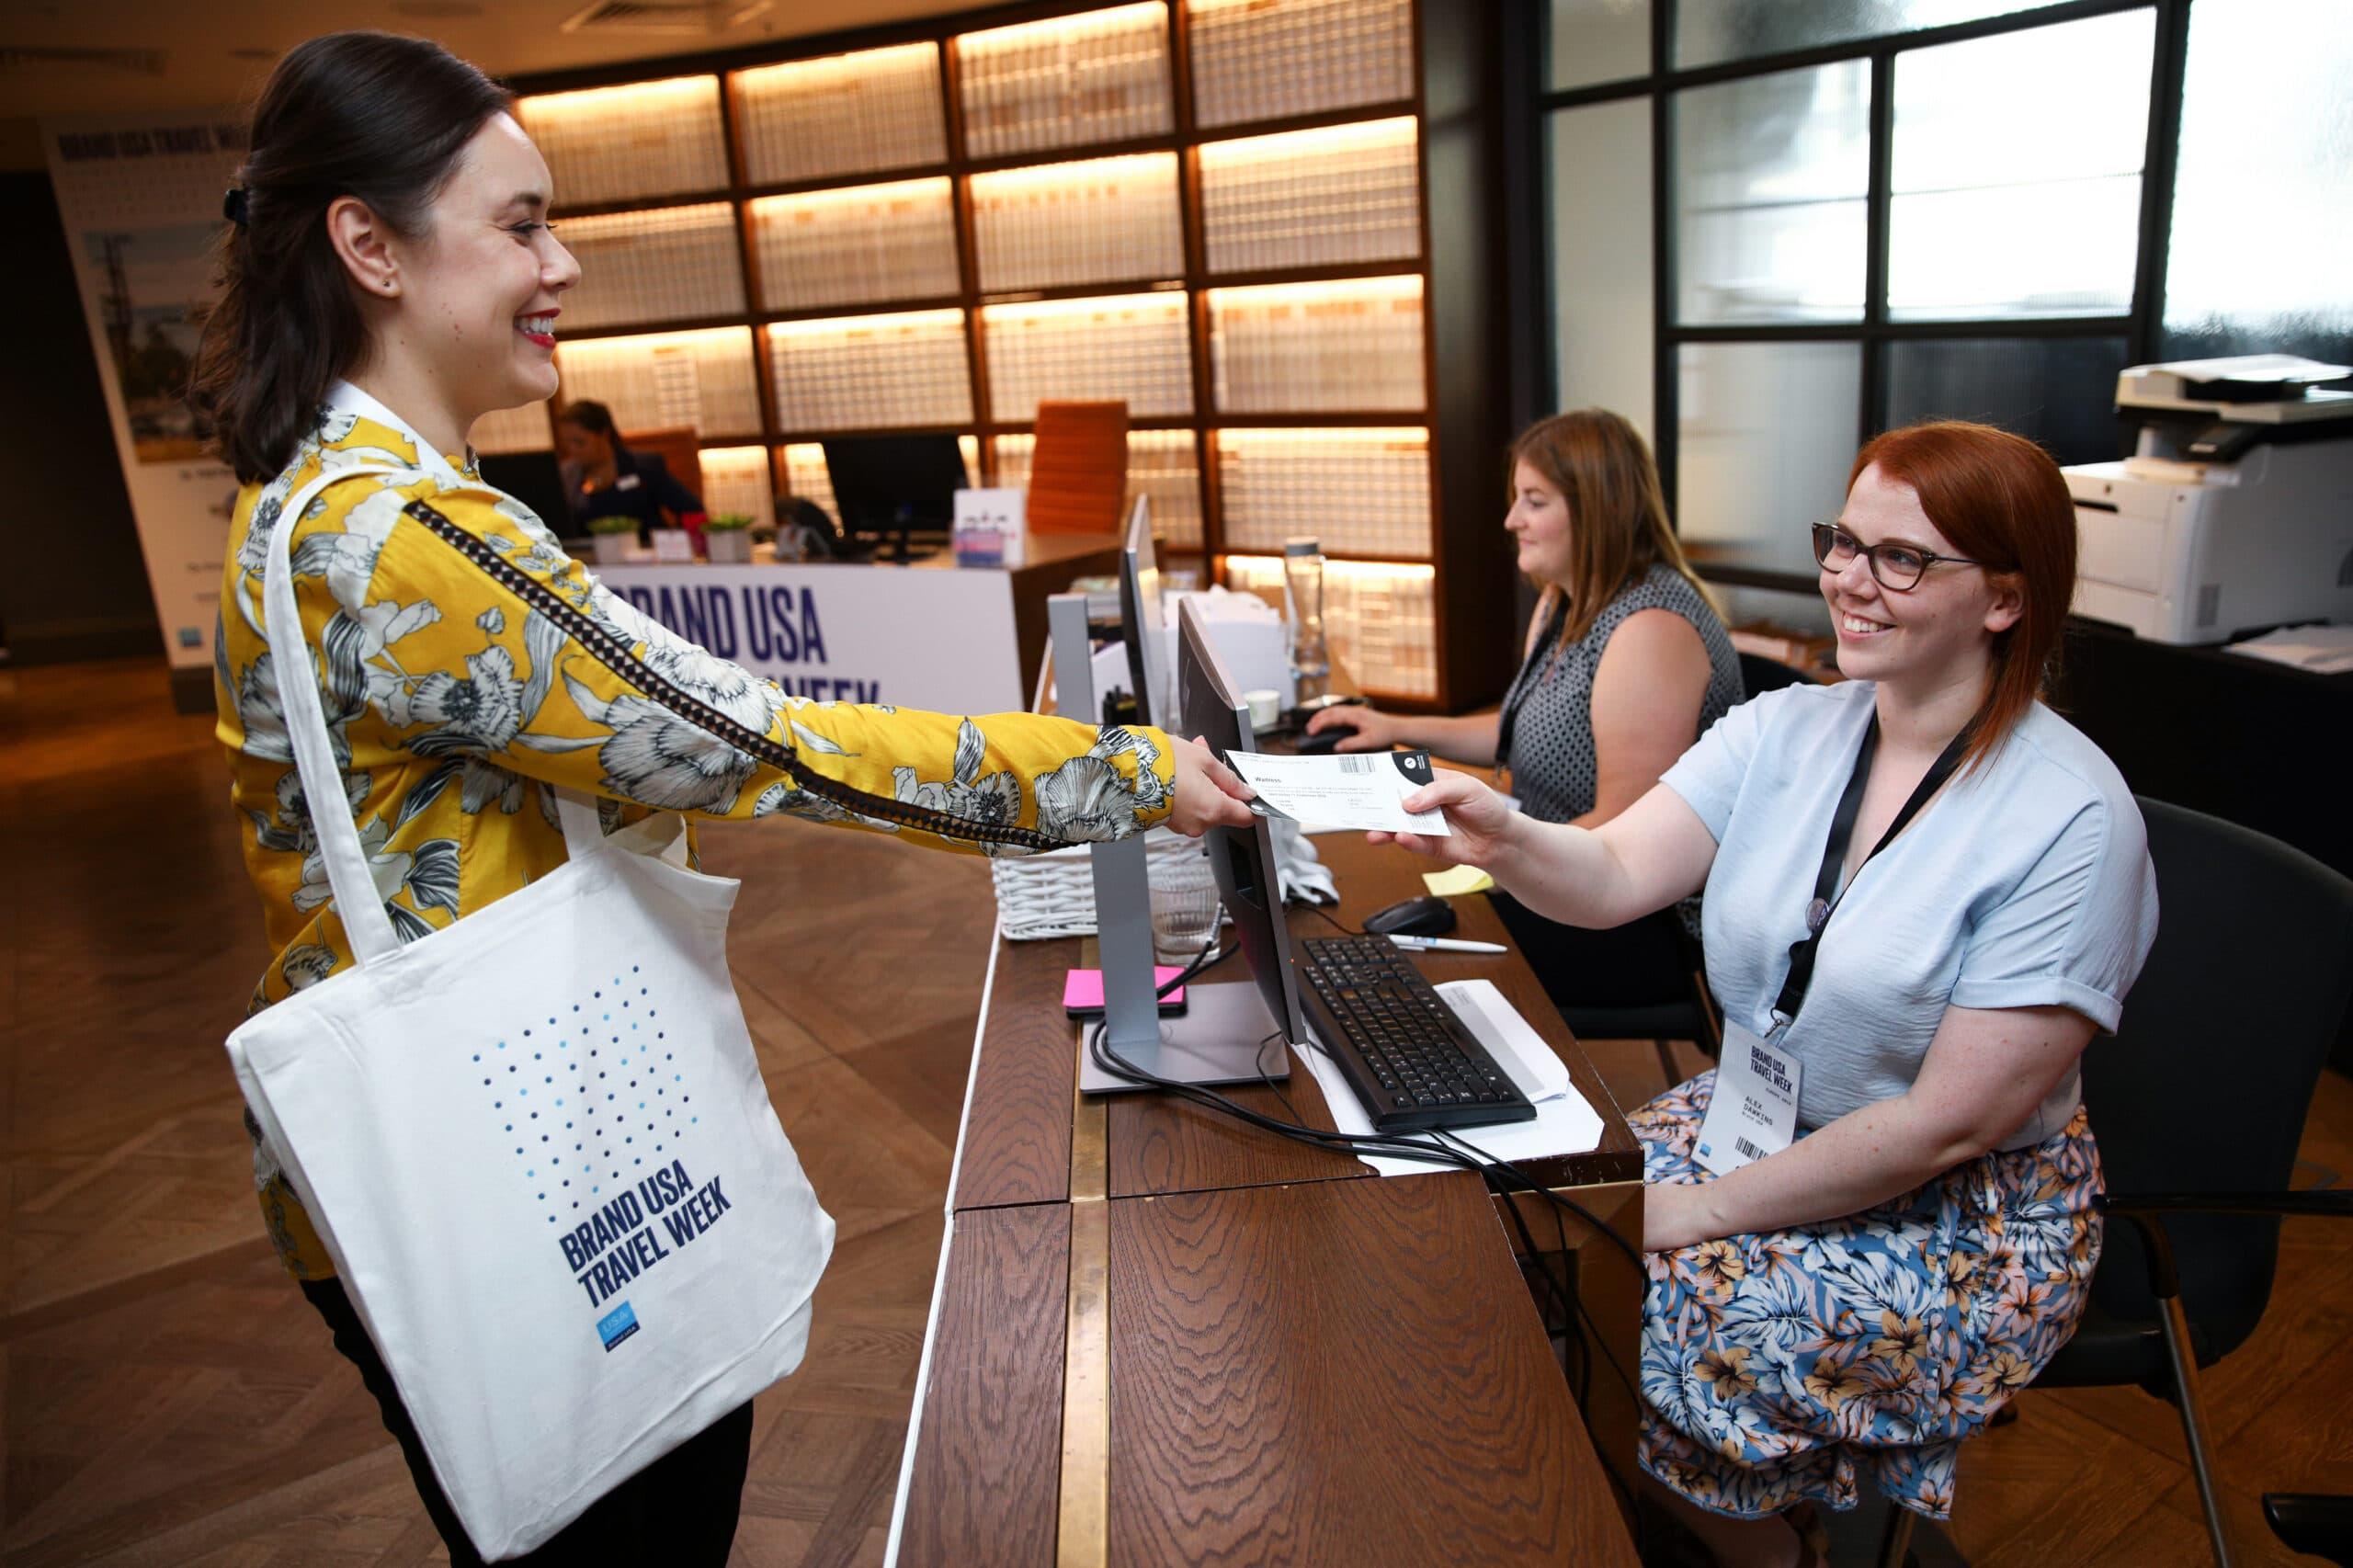 Brand-USA-Travel_Week-Welcome-Desk-Citizen